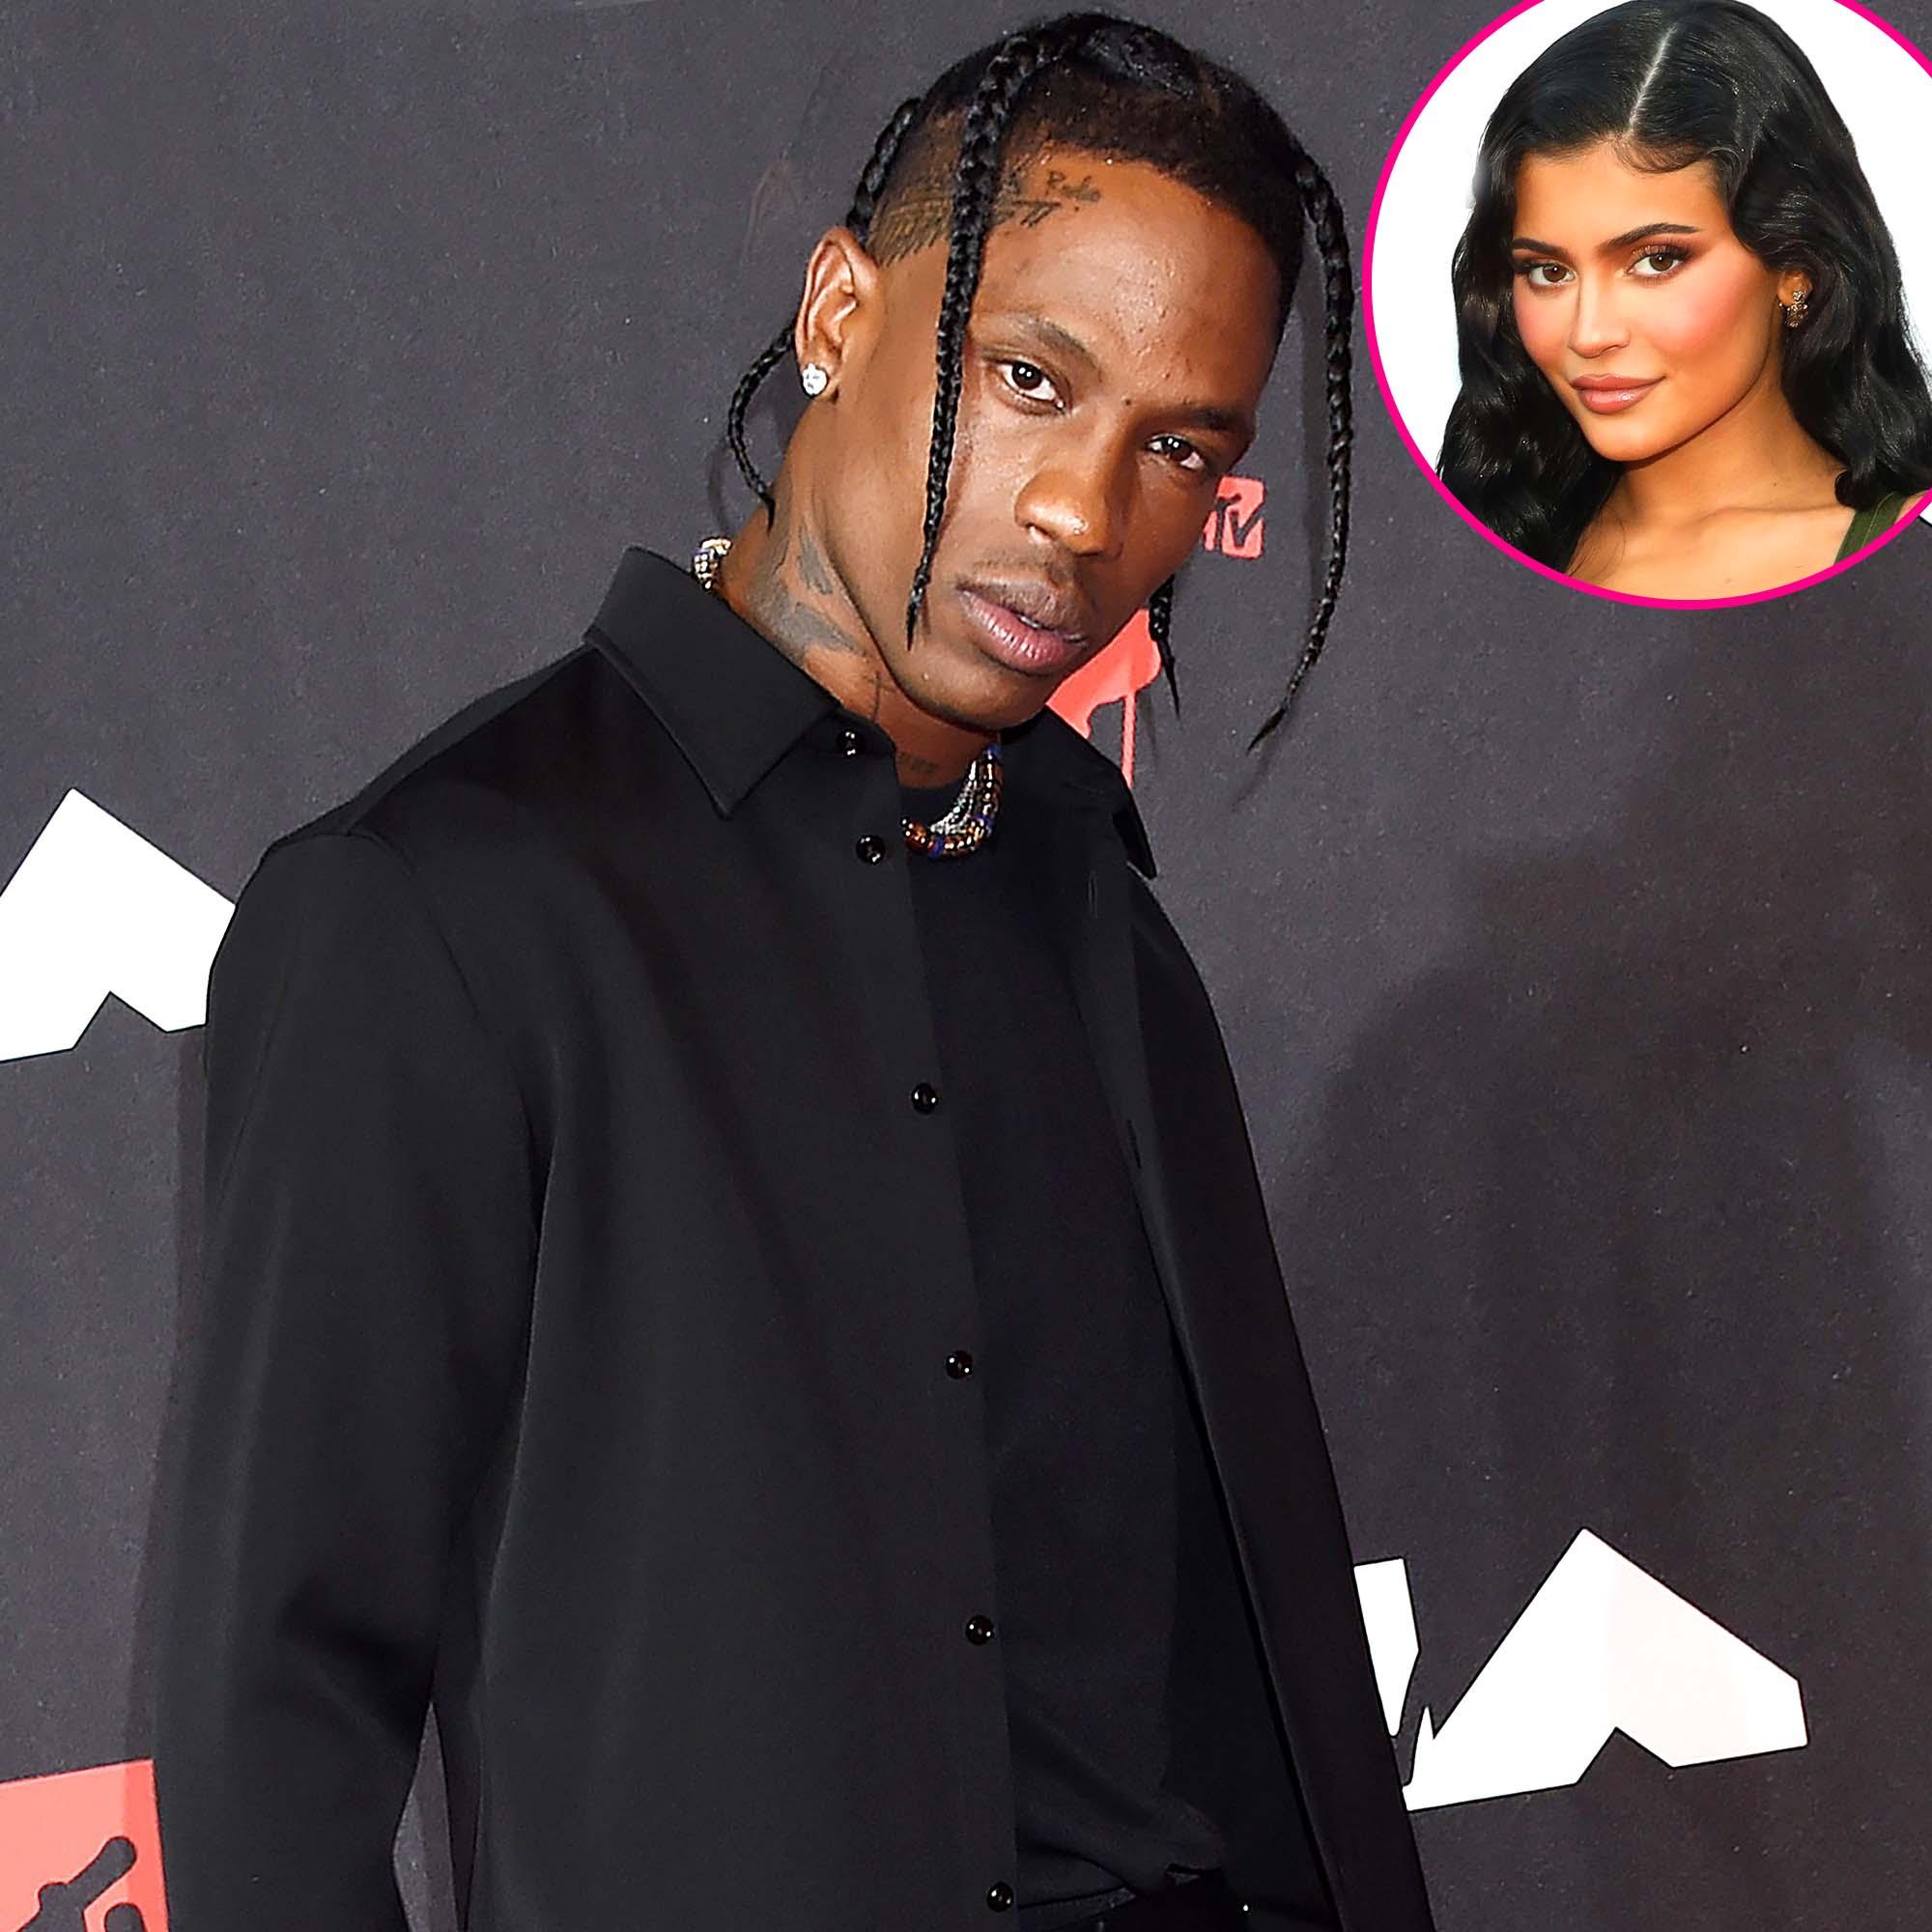 Travis Scott Attends VMAs Without Pregnant Kylie Jenner